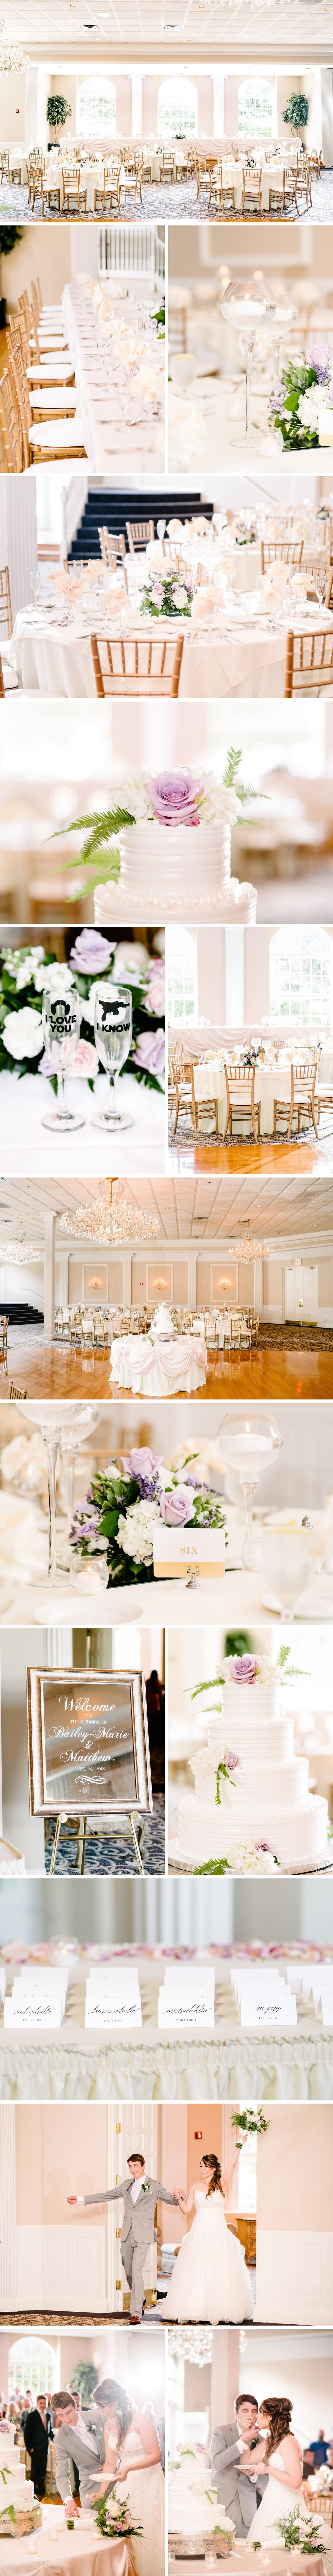 chicago-fine-art-wedding-photography-iwinski10